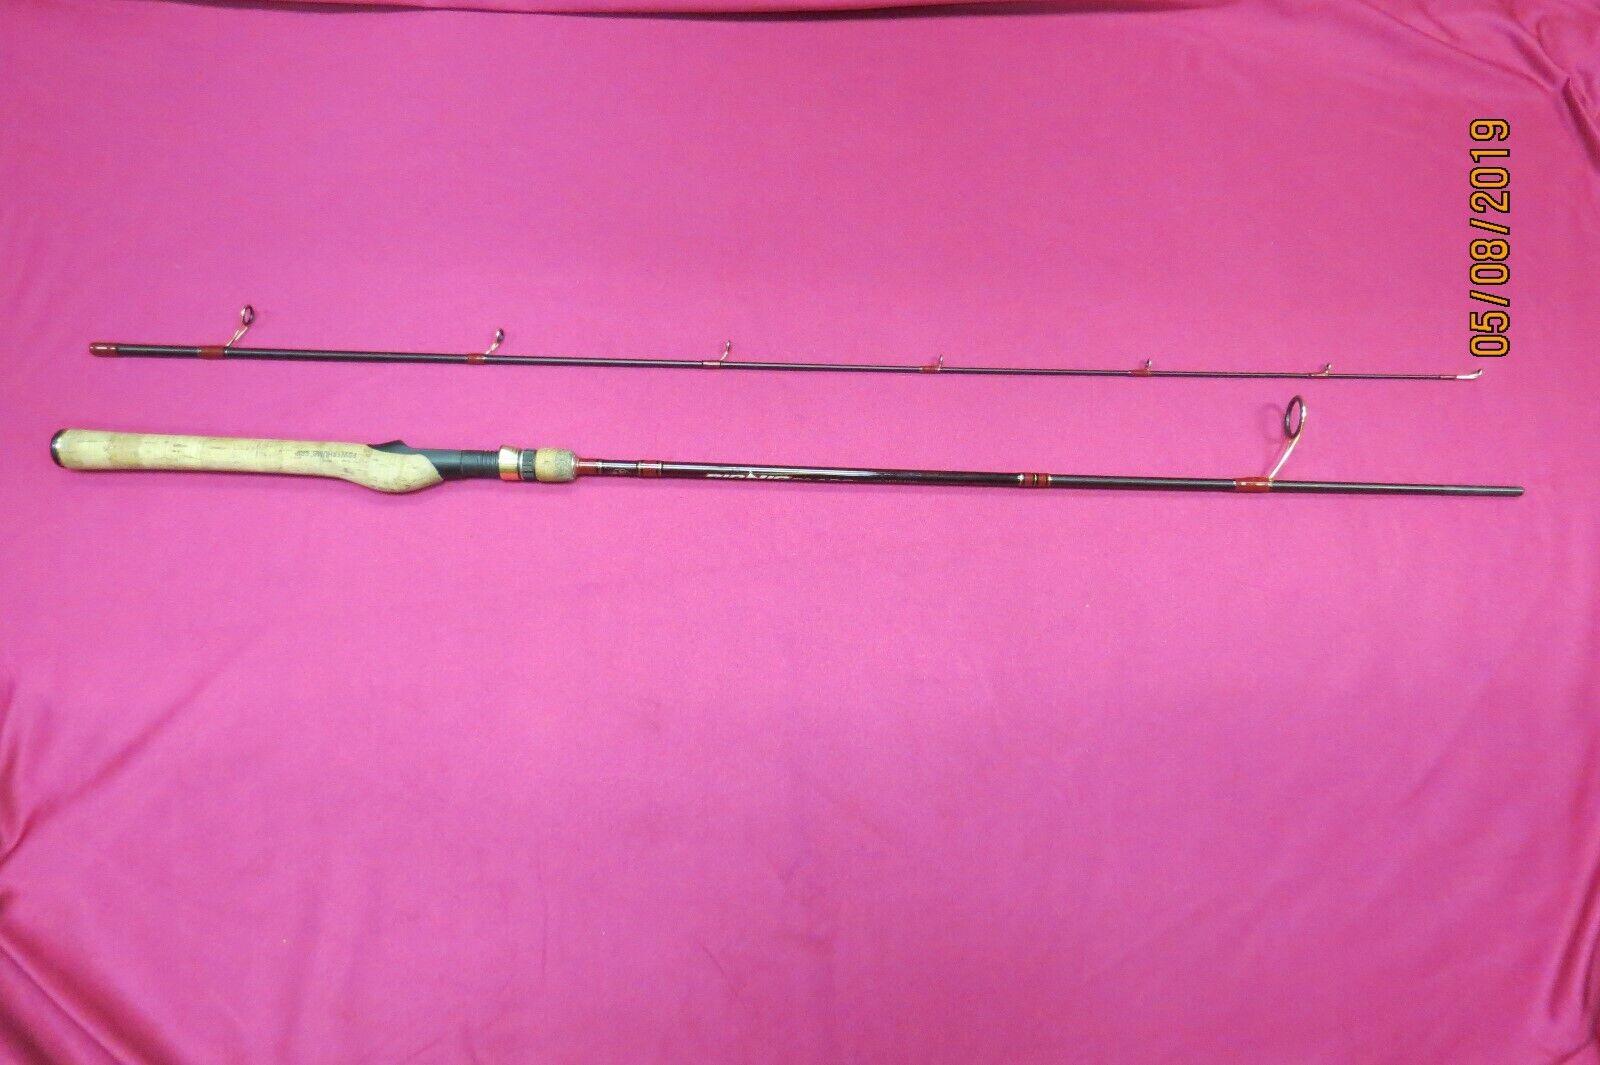 BASS PRO SHOPS BIONIC BLADE BNB66MHS-2  6'6  FISHING ROD  more affordable